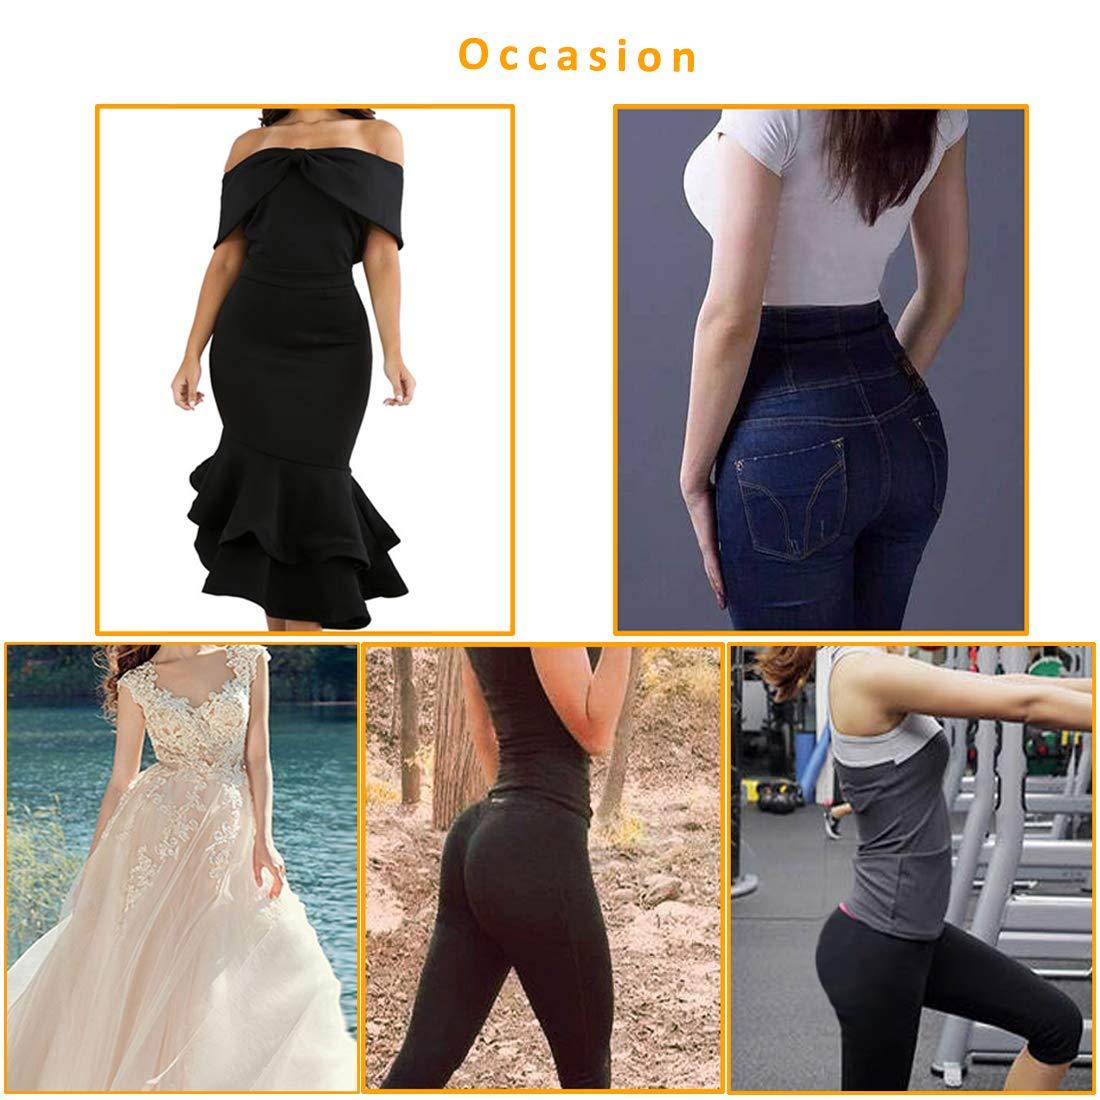 WOWENY High Waist Shaper Donna Contenitiva a Vita Alta Mutande Seamless Tummy Belly Control Slimming Shapewear Corset Panties Girdle Underwear